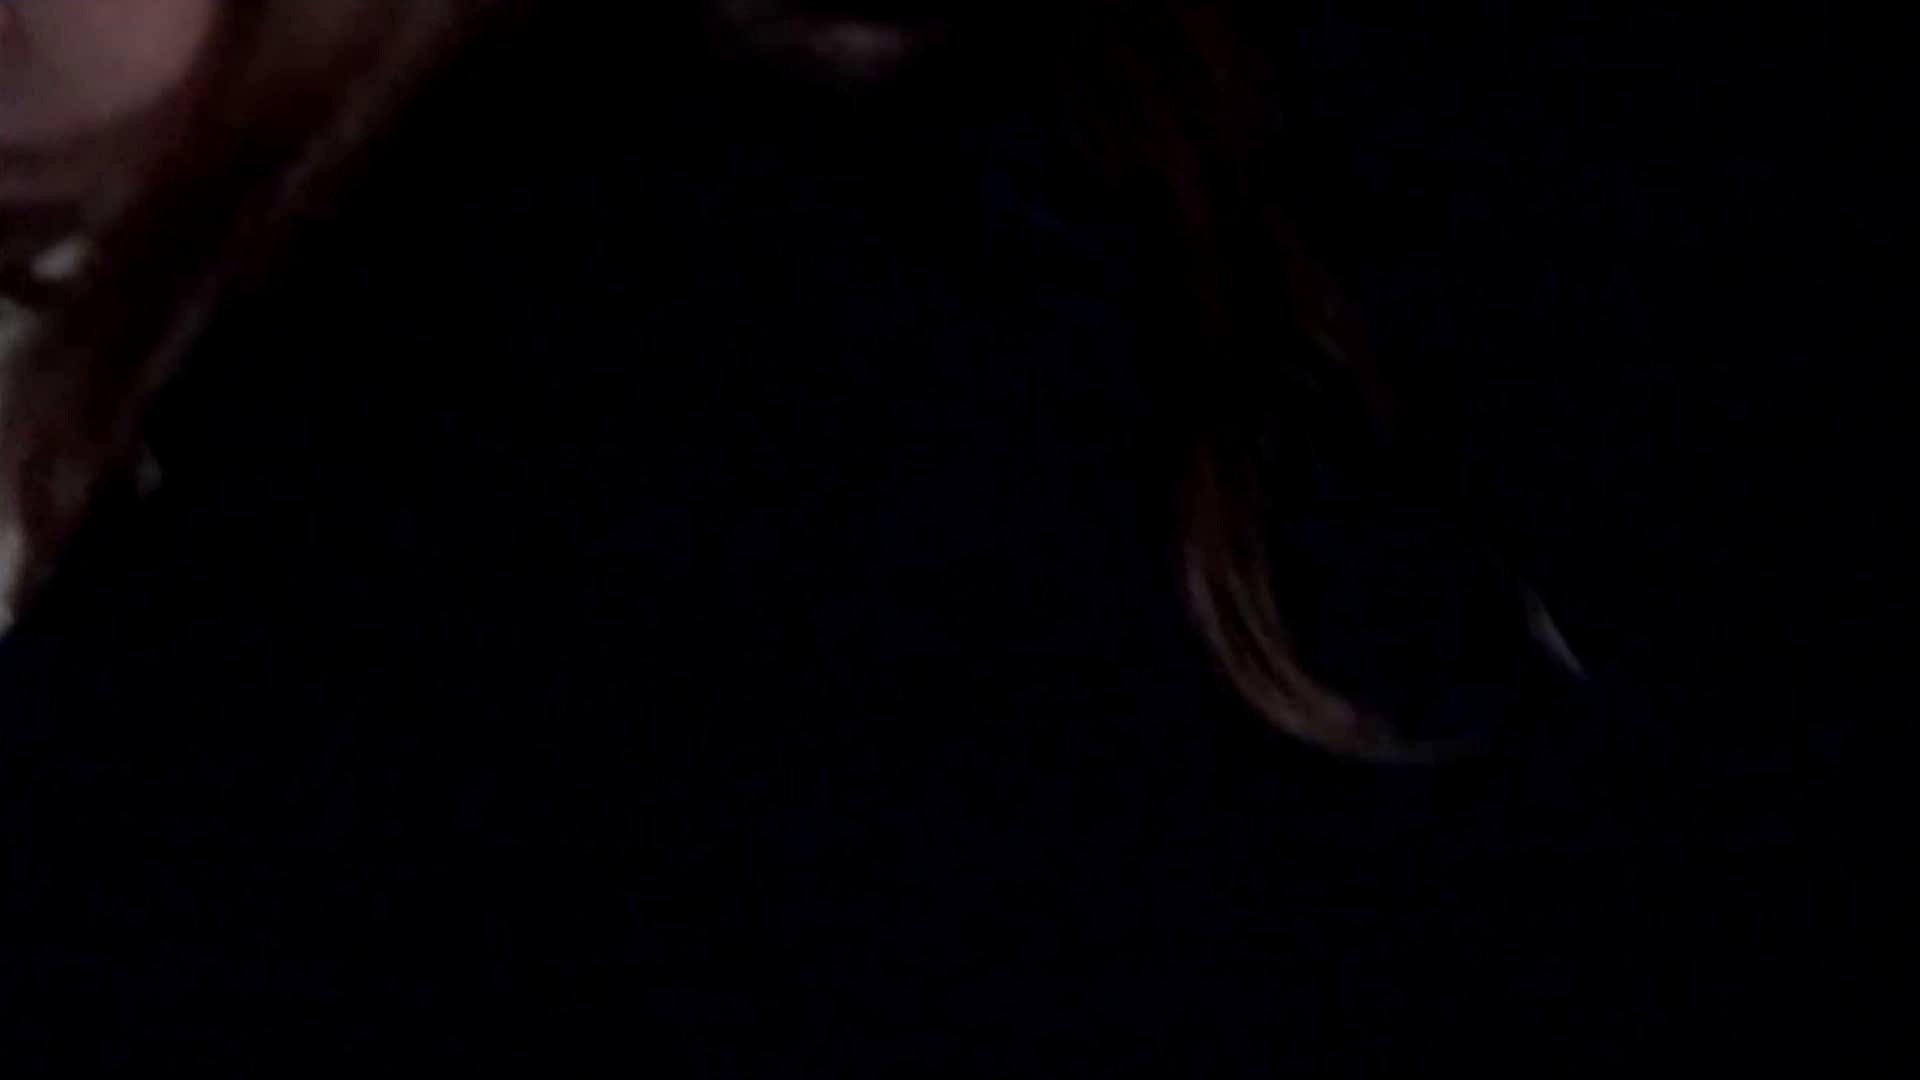 vol.33 【H・Kちゃん】 セクシー系ギャル現役JD 1回目 丸見え おまんこ無修正動画無料 111枚 50